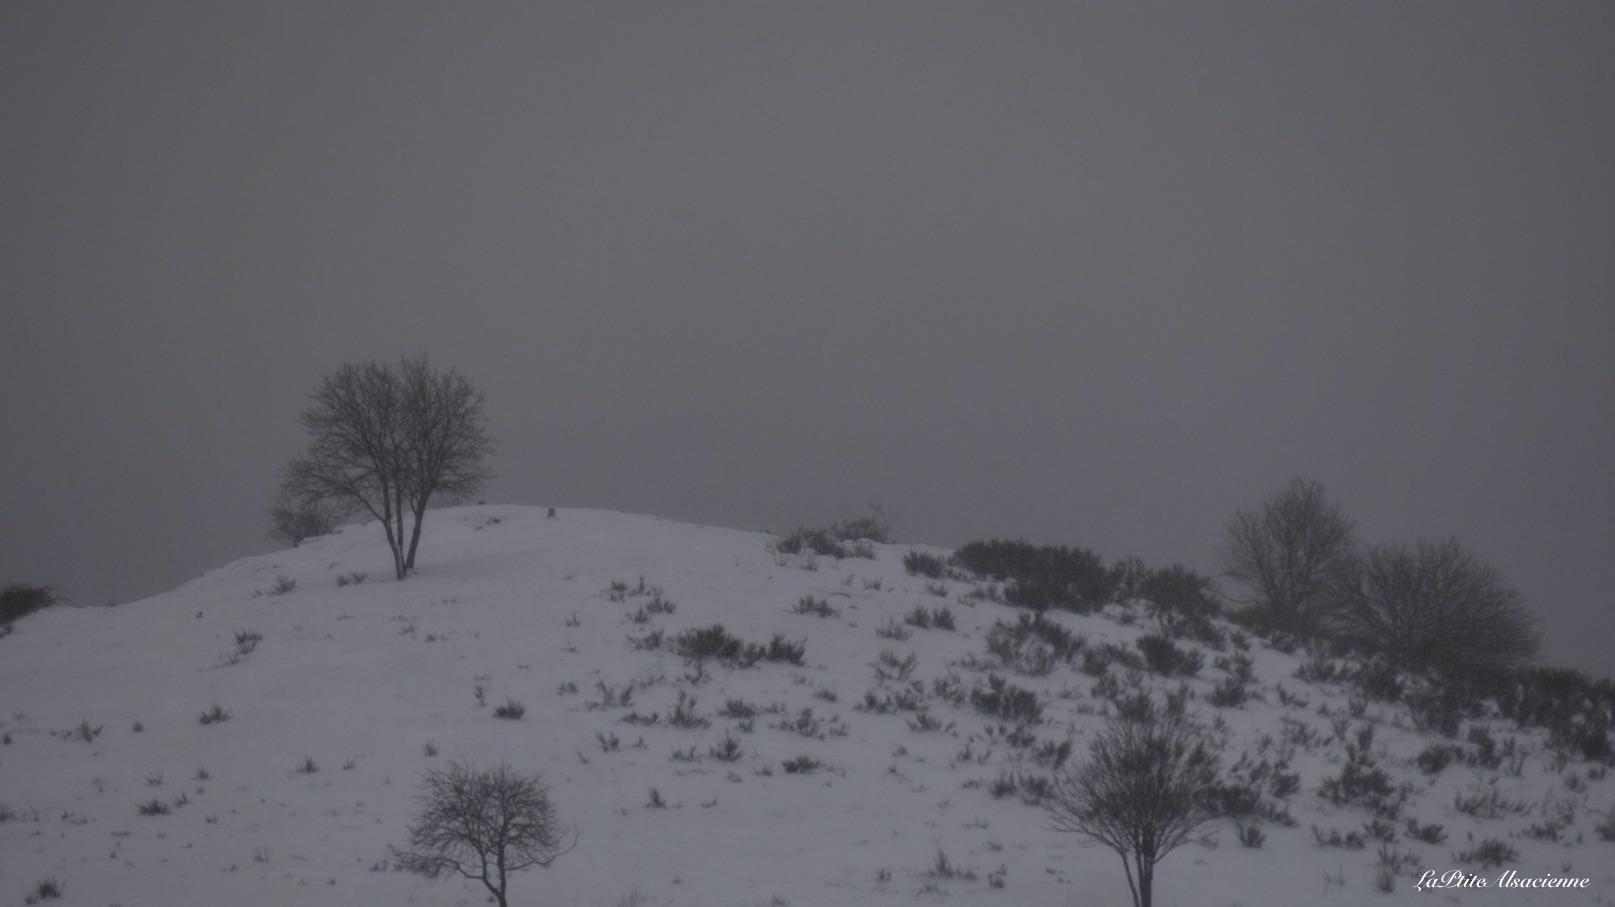 Ebeneck sous neige